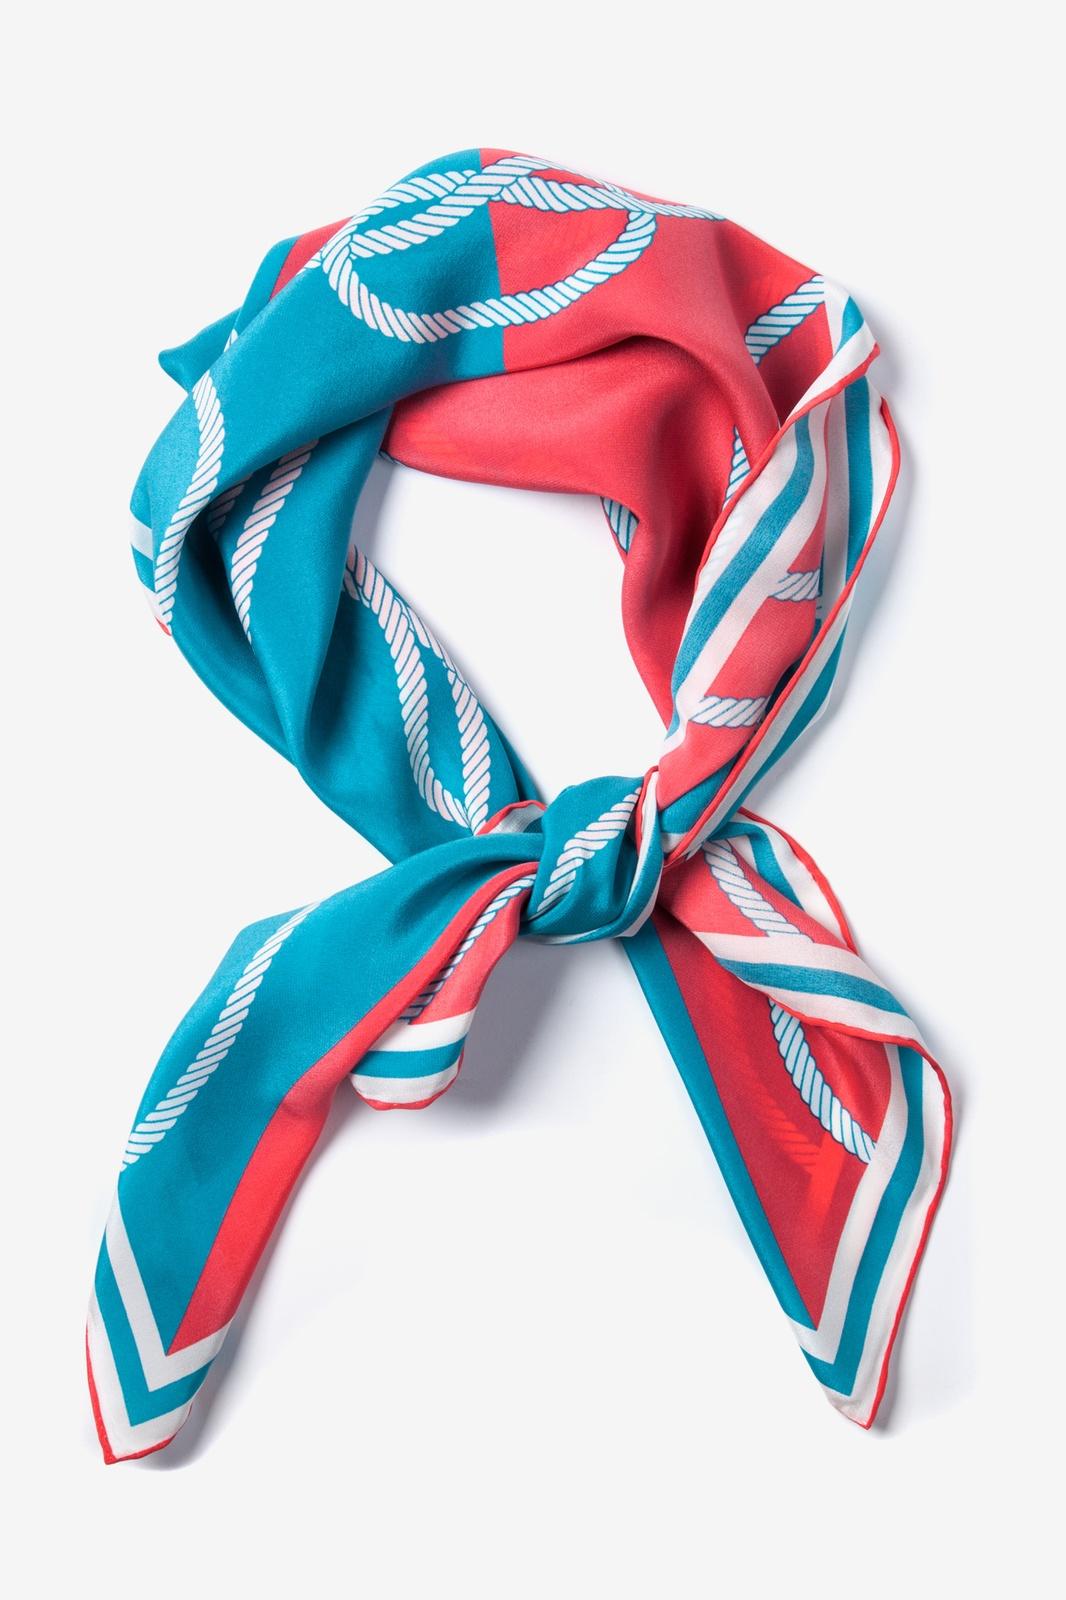 aqua-silk-feeling-knotty-square-scarf-238125-105-1600-0.jpg